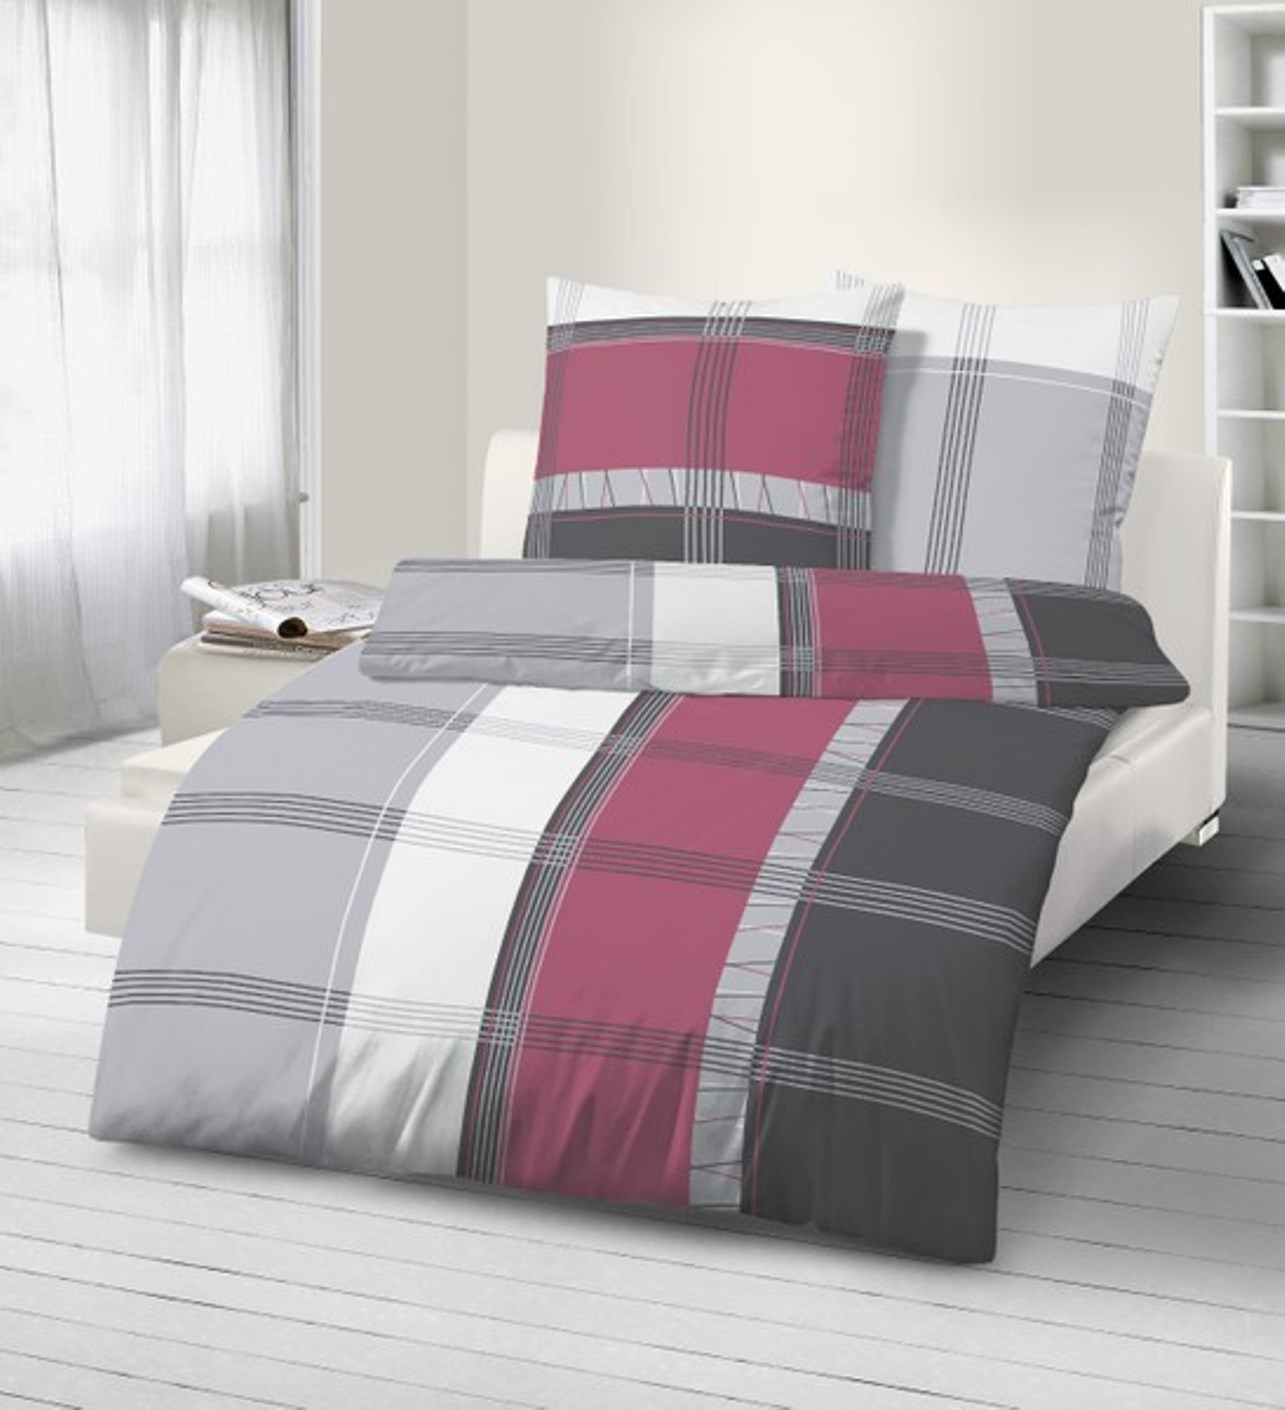 fein biber bettw sche 2 bordeaux 155x220 cm 80x80 cm bergr e ebay. Black Bedroom Furniture Sets. Home Design Ideas